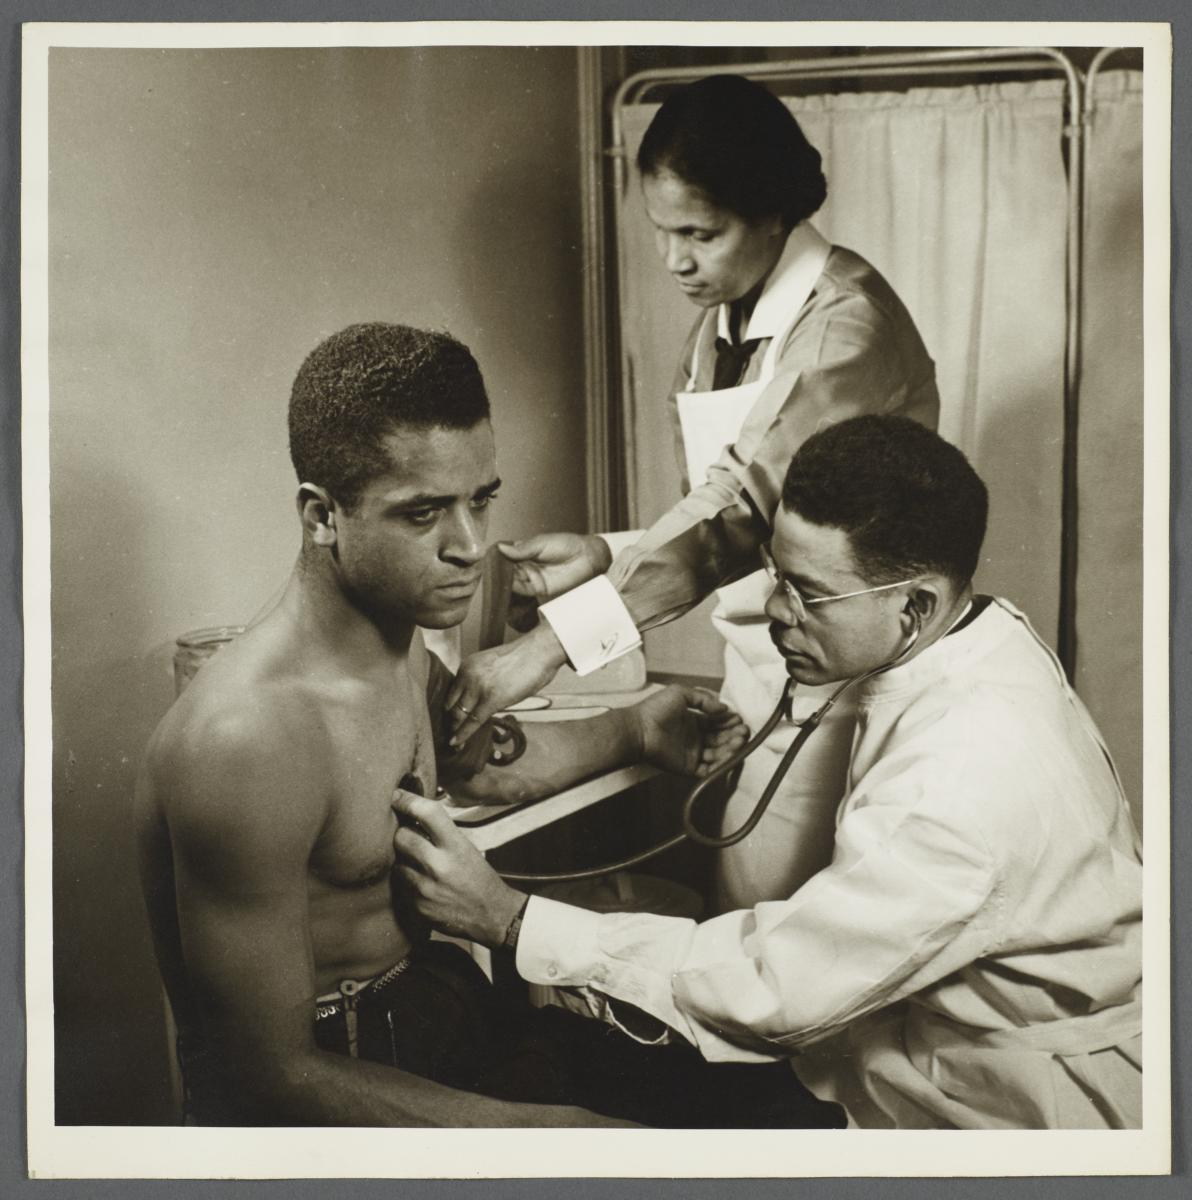 Moton Health Center Album -- Health Examination of Father